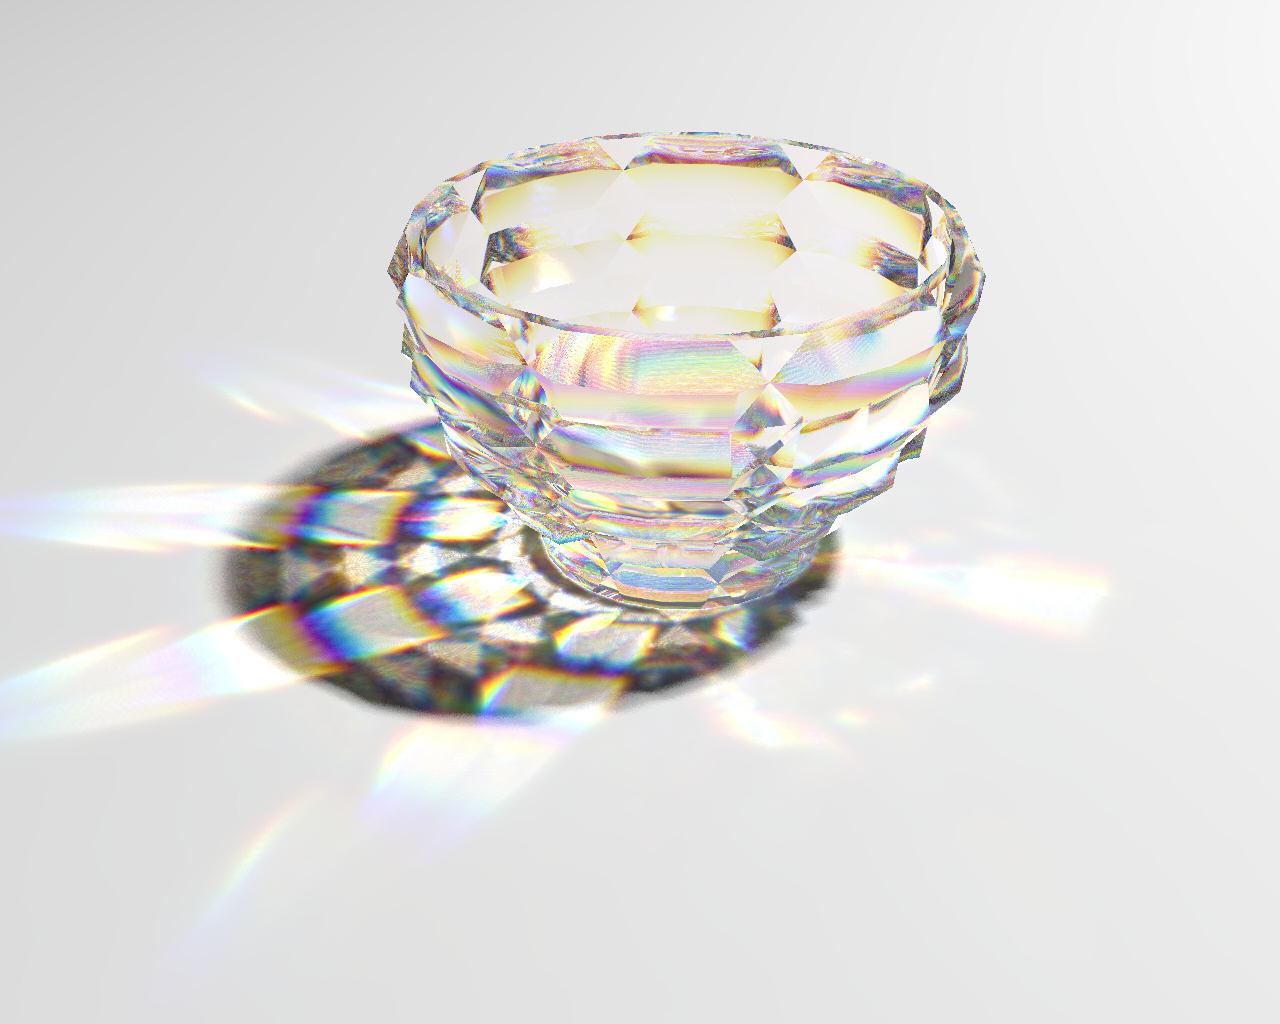 rendering crystal glass caustics